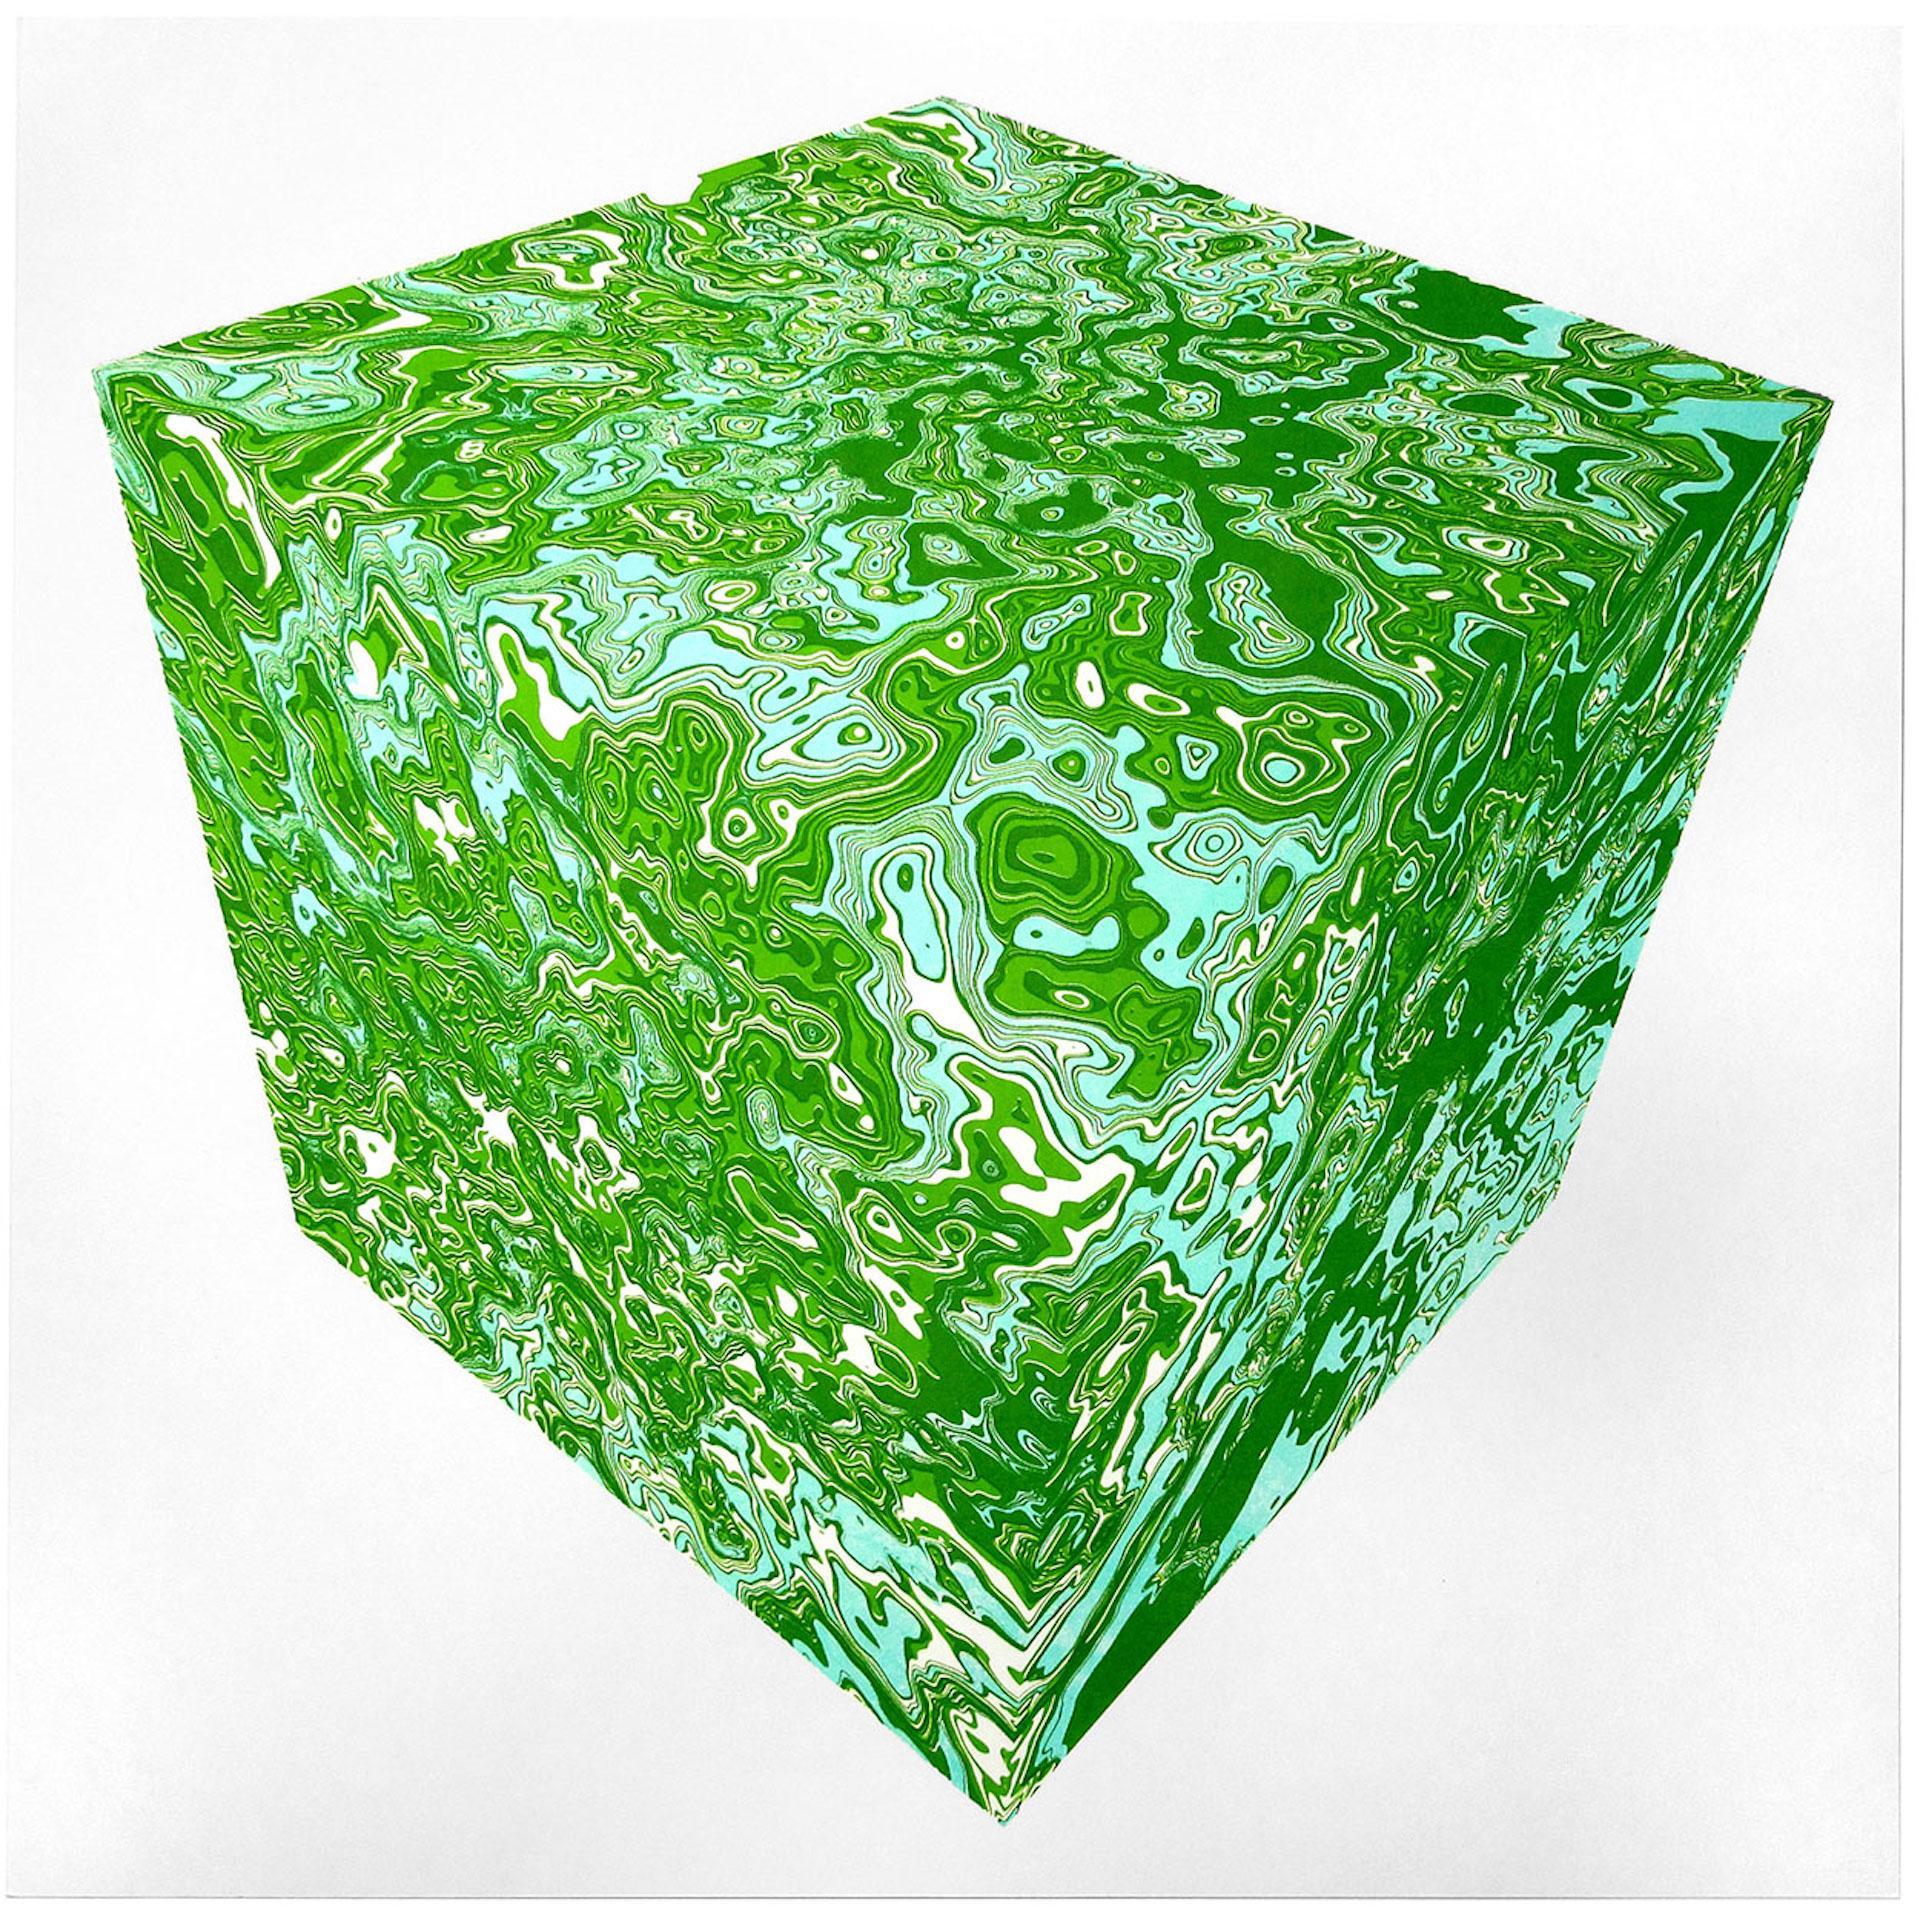 Chris Keegan, Cube, Limited Edition Geometric Art, Contemporary Minimalist Art